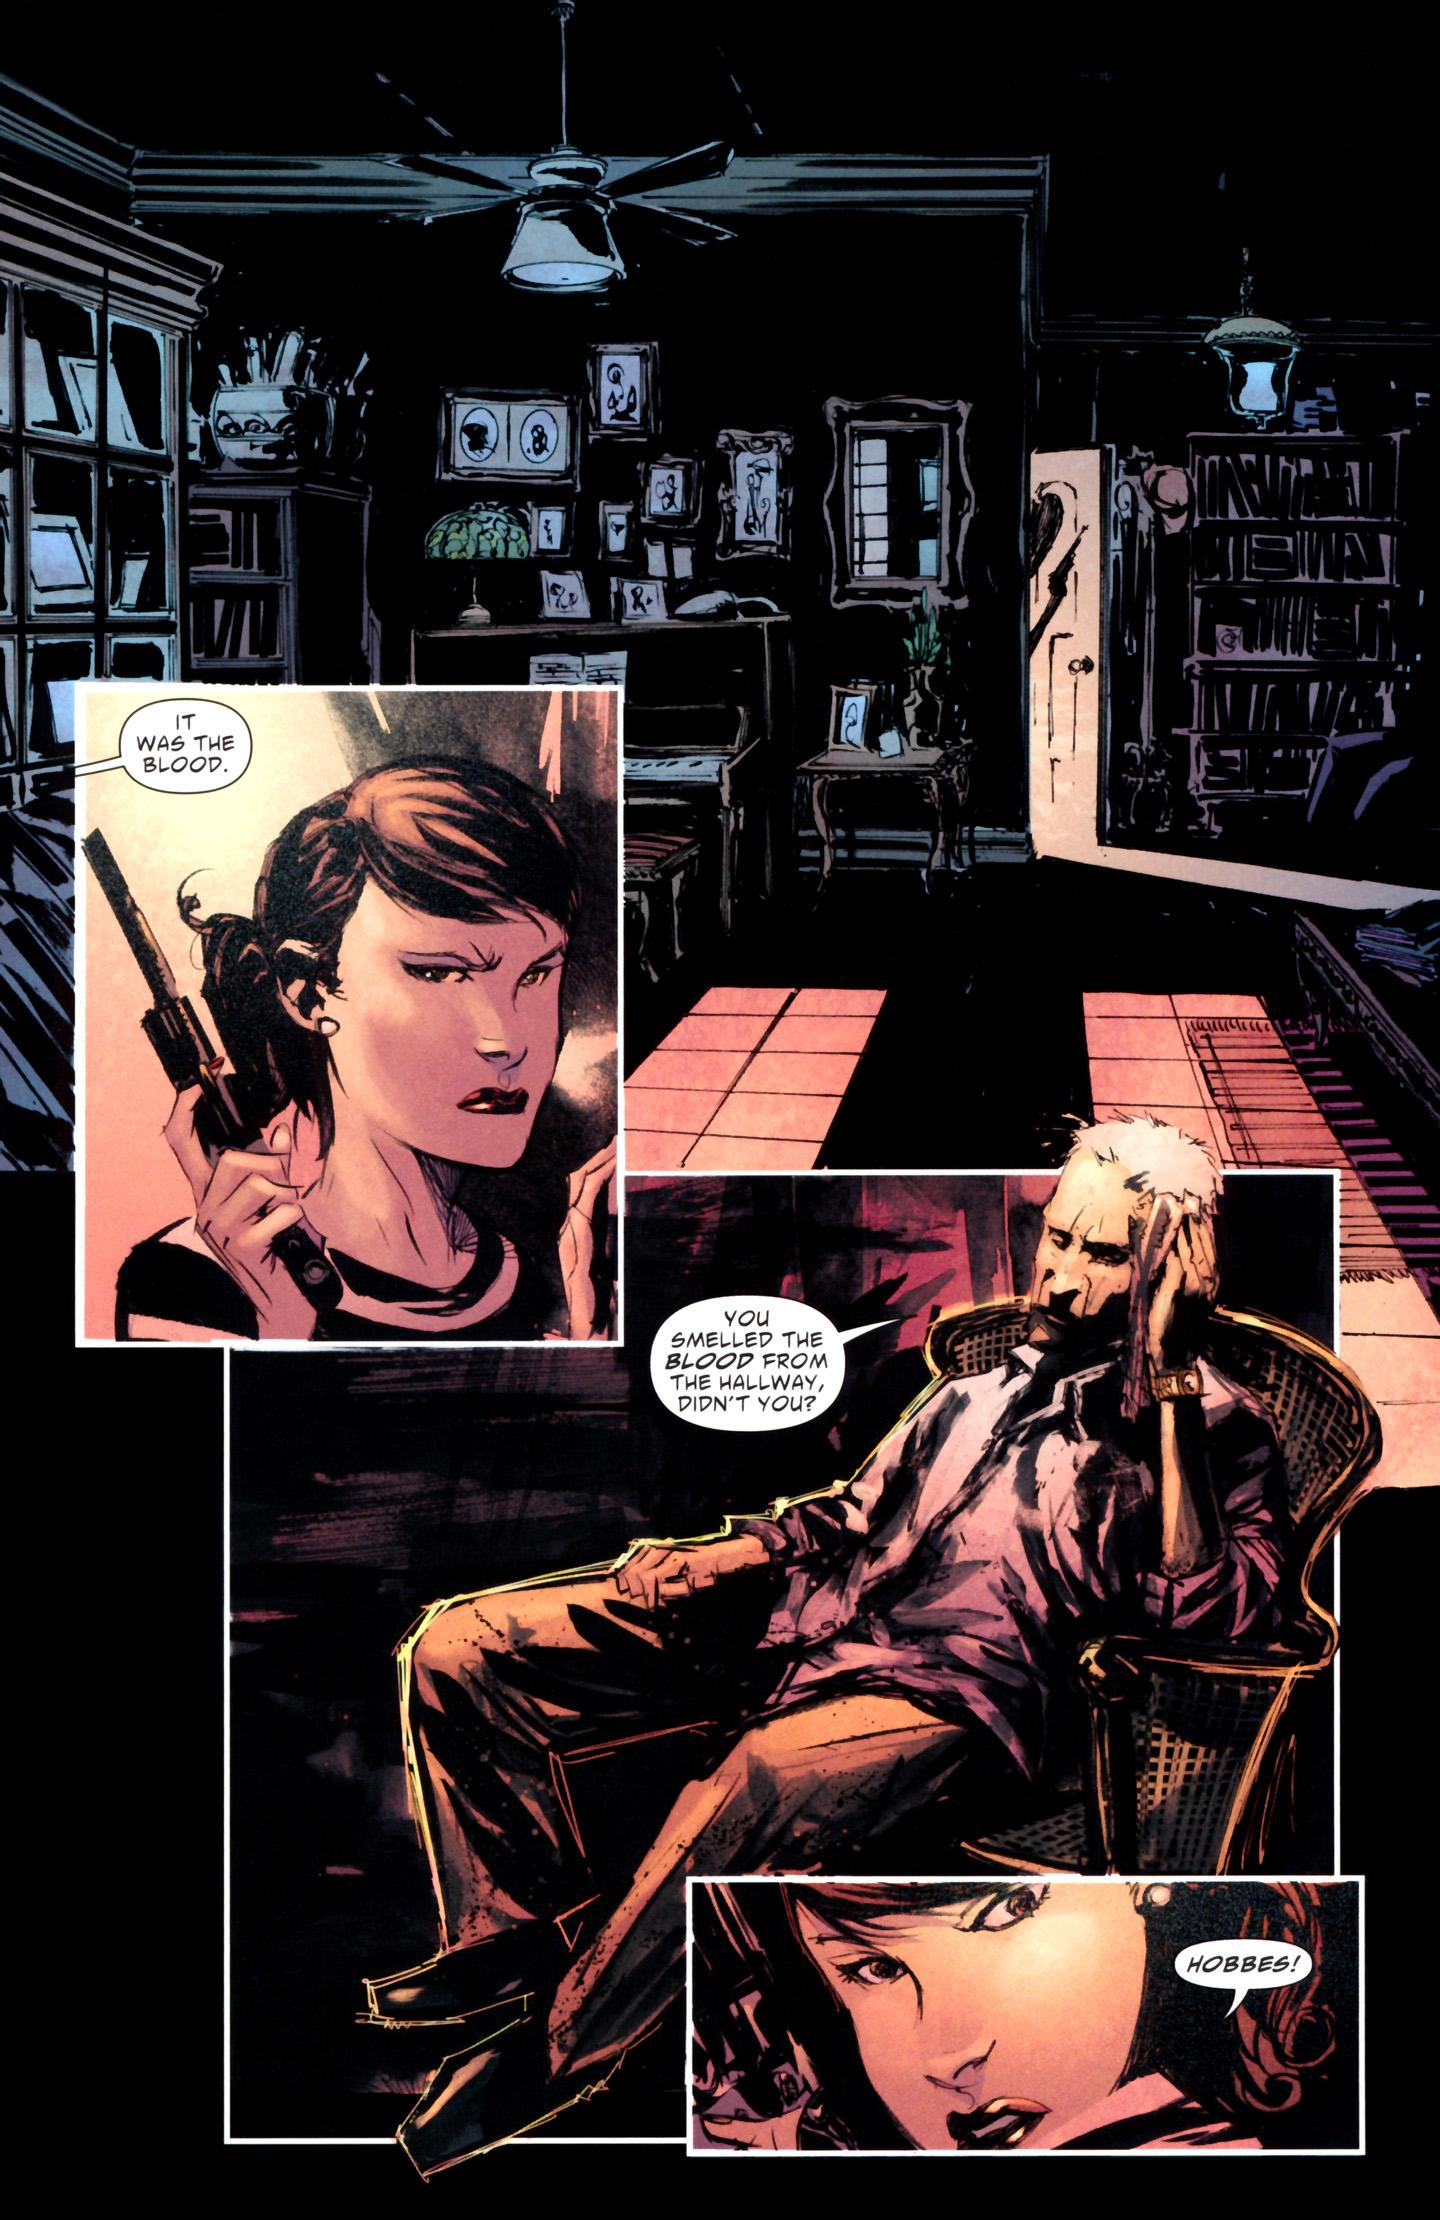 Read online American Vampire: Lord of Nightmares comic -  Issue #1 - 23